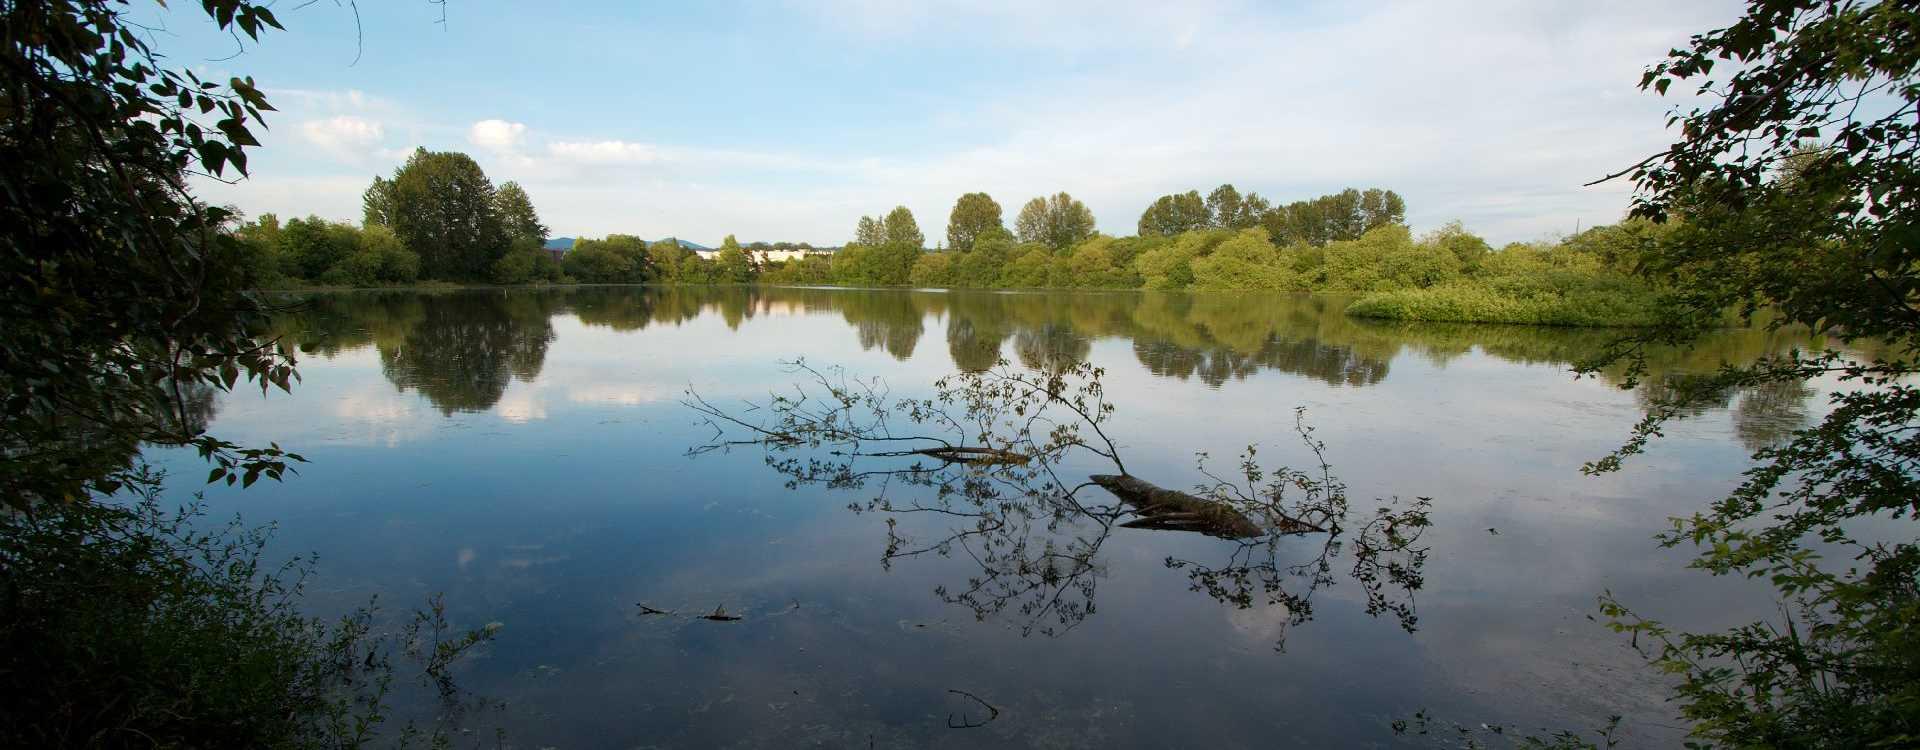 Tukwila-Pond